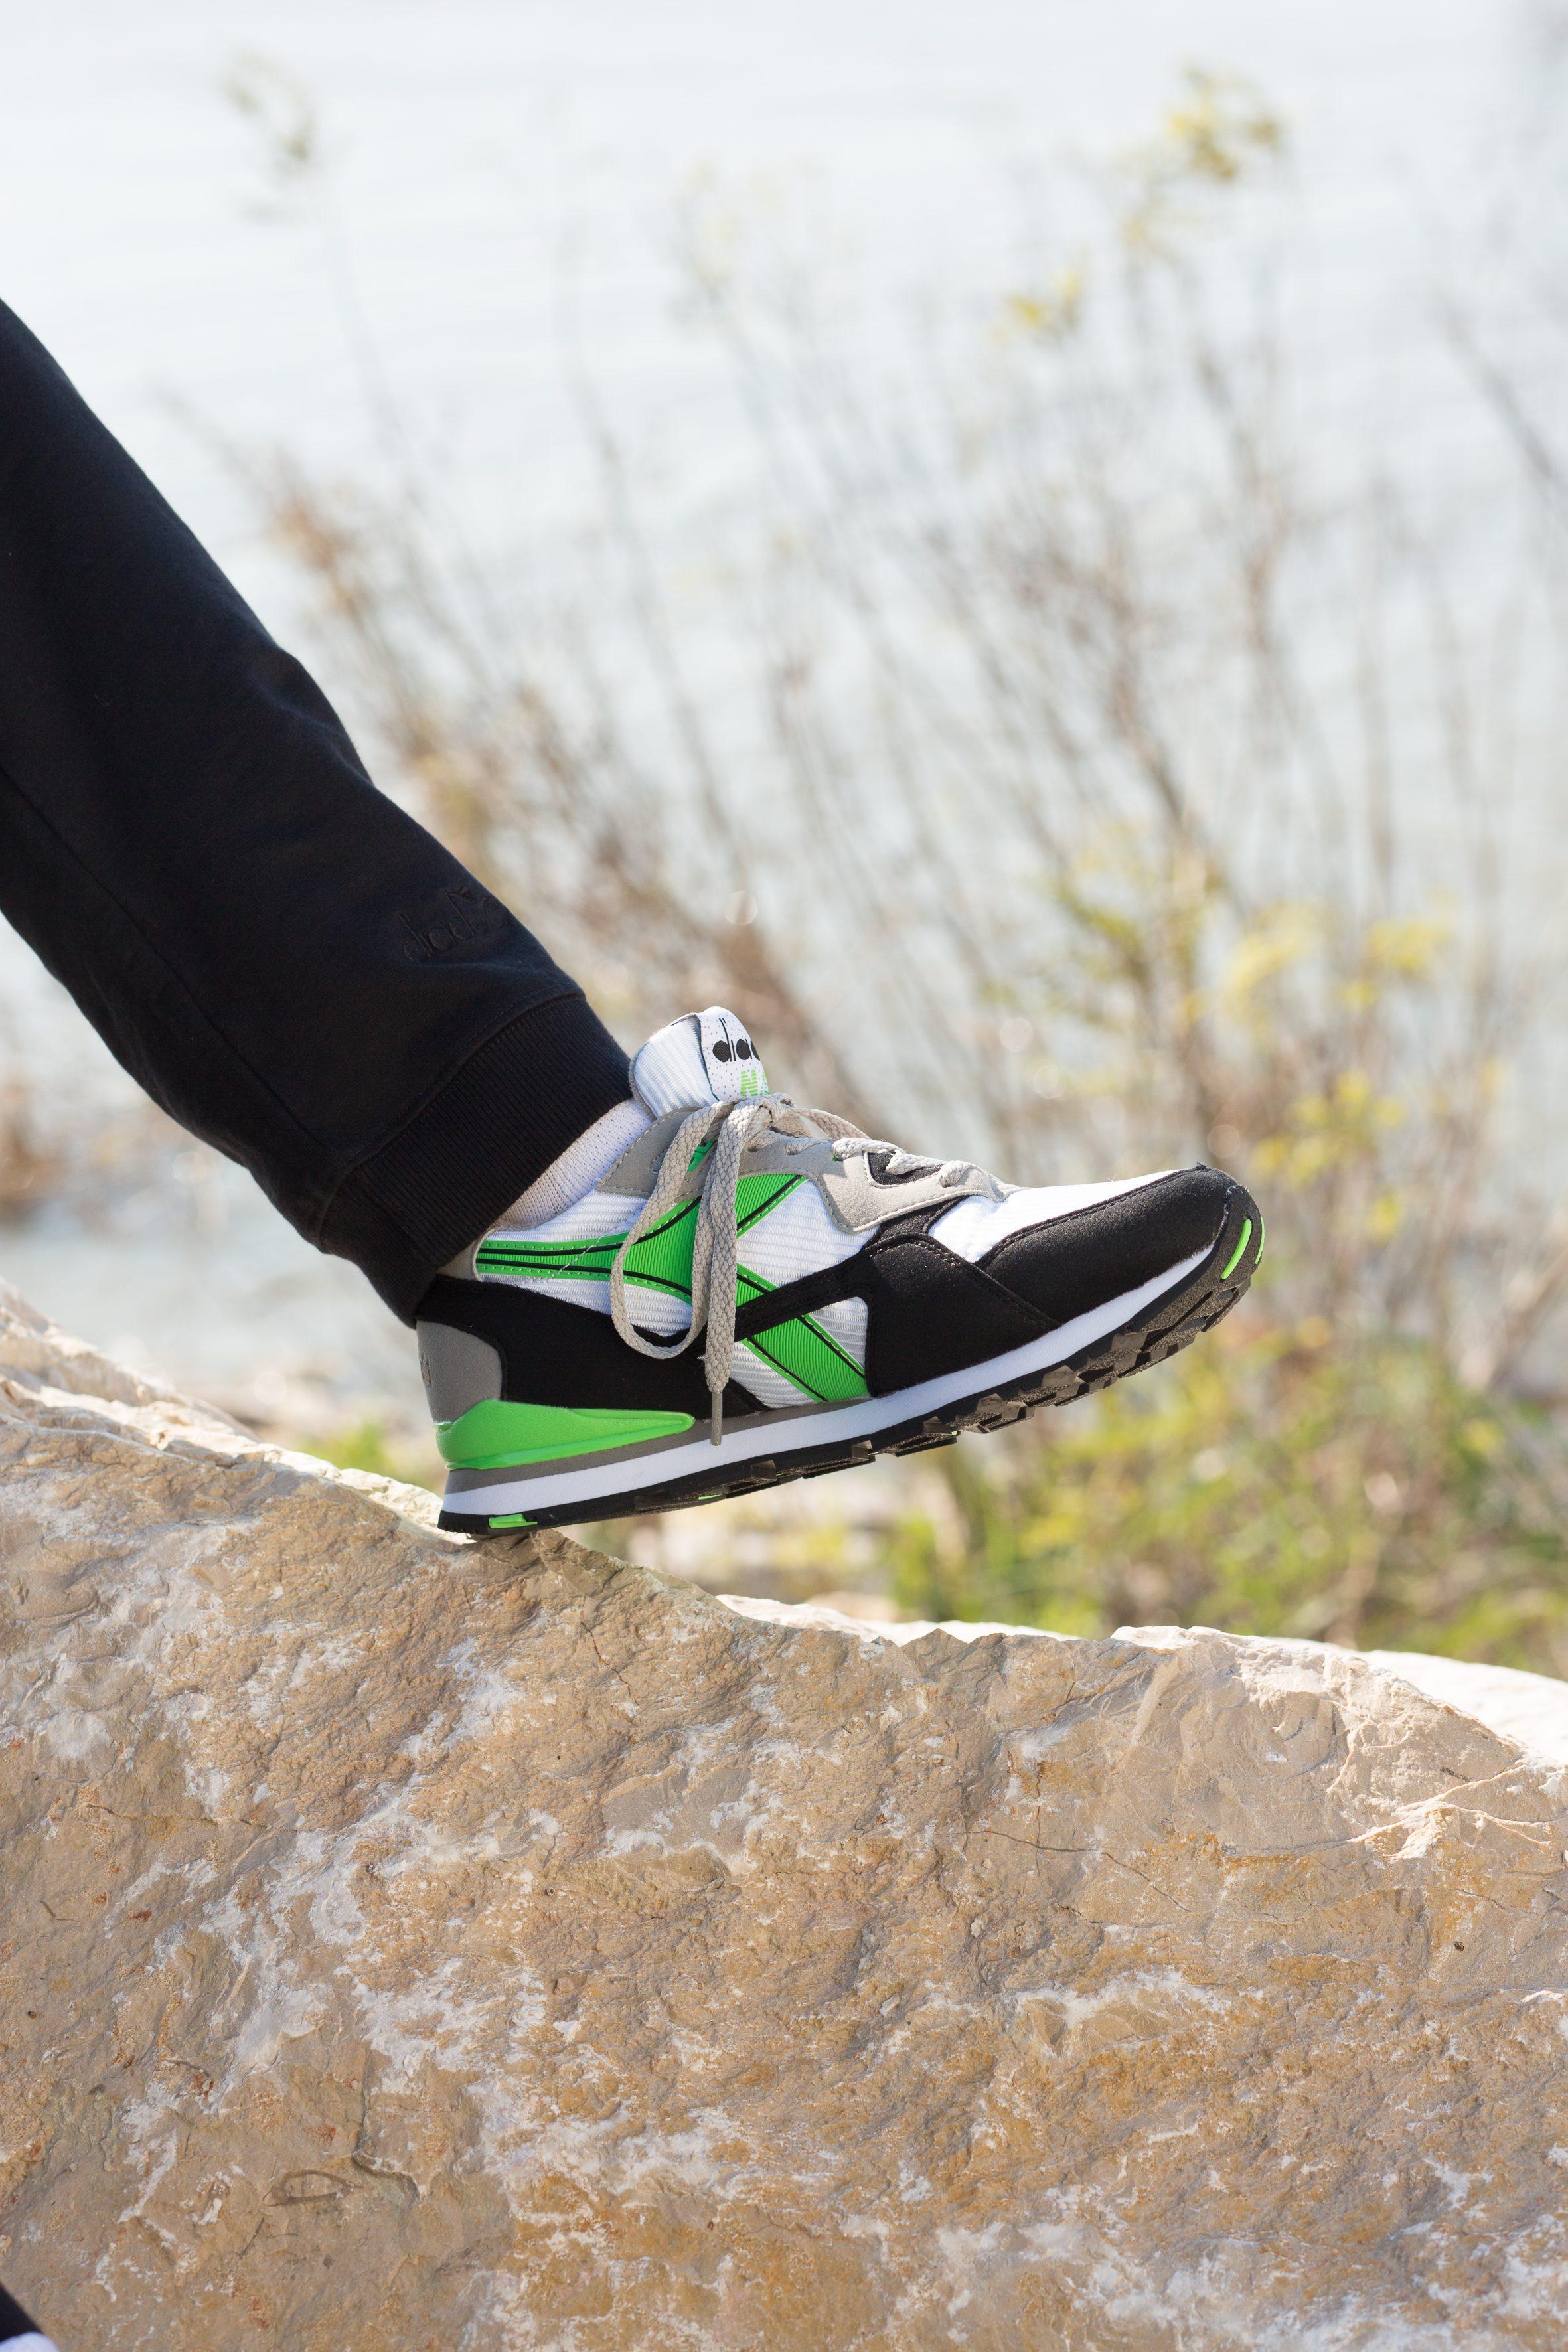 Dutch_Hero_Wouther_Weldman_Sportswear_N92 shoes_2.jpg